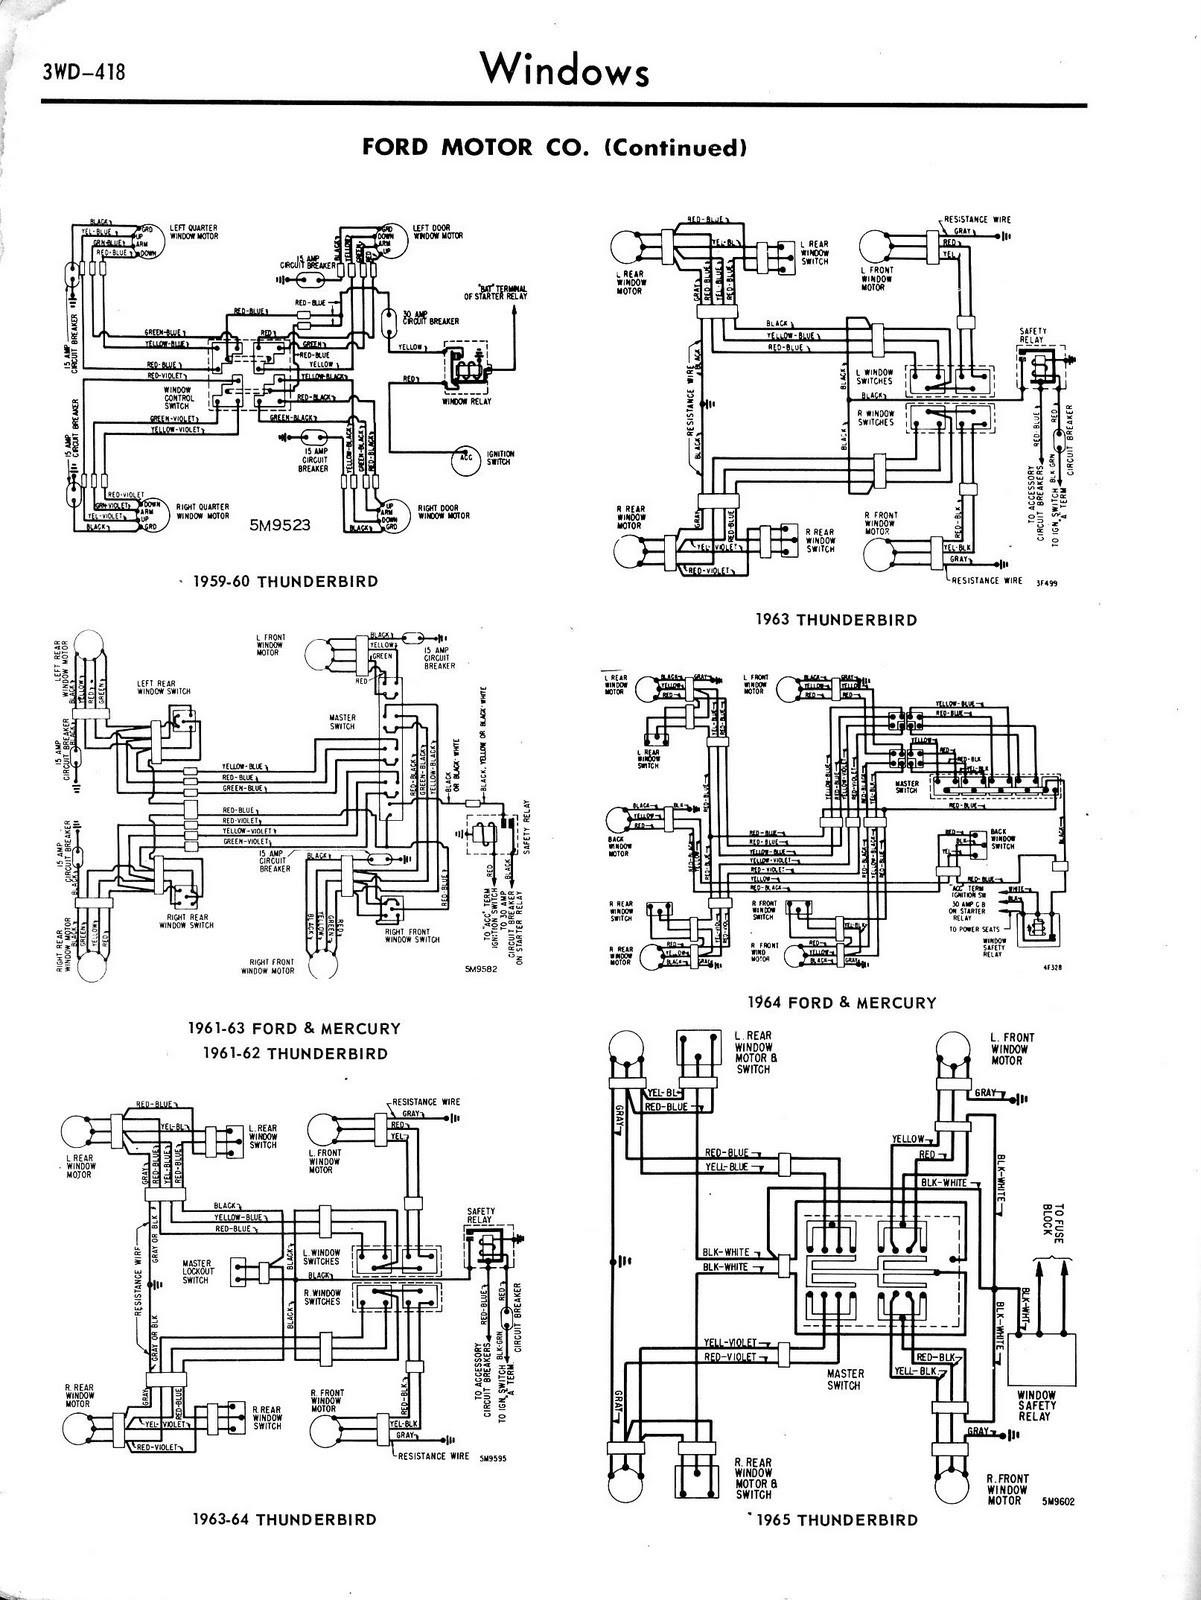 2000 Dodge Intrepid 2 7 Engine Diagram 2 50ee Overdrive Wiring Diagram Of 2000 Dodge Intrepid 2 7 Engine Diagram 2